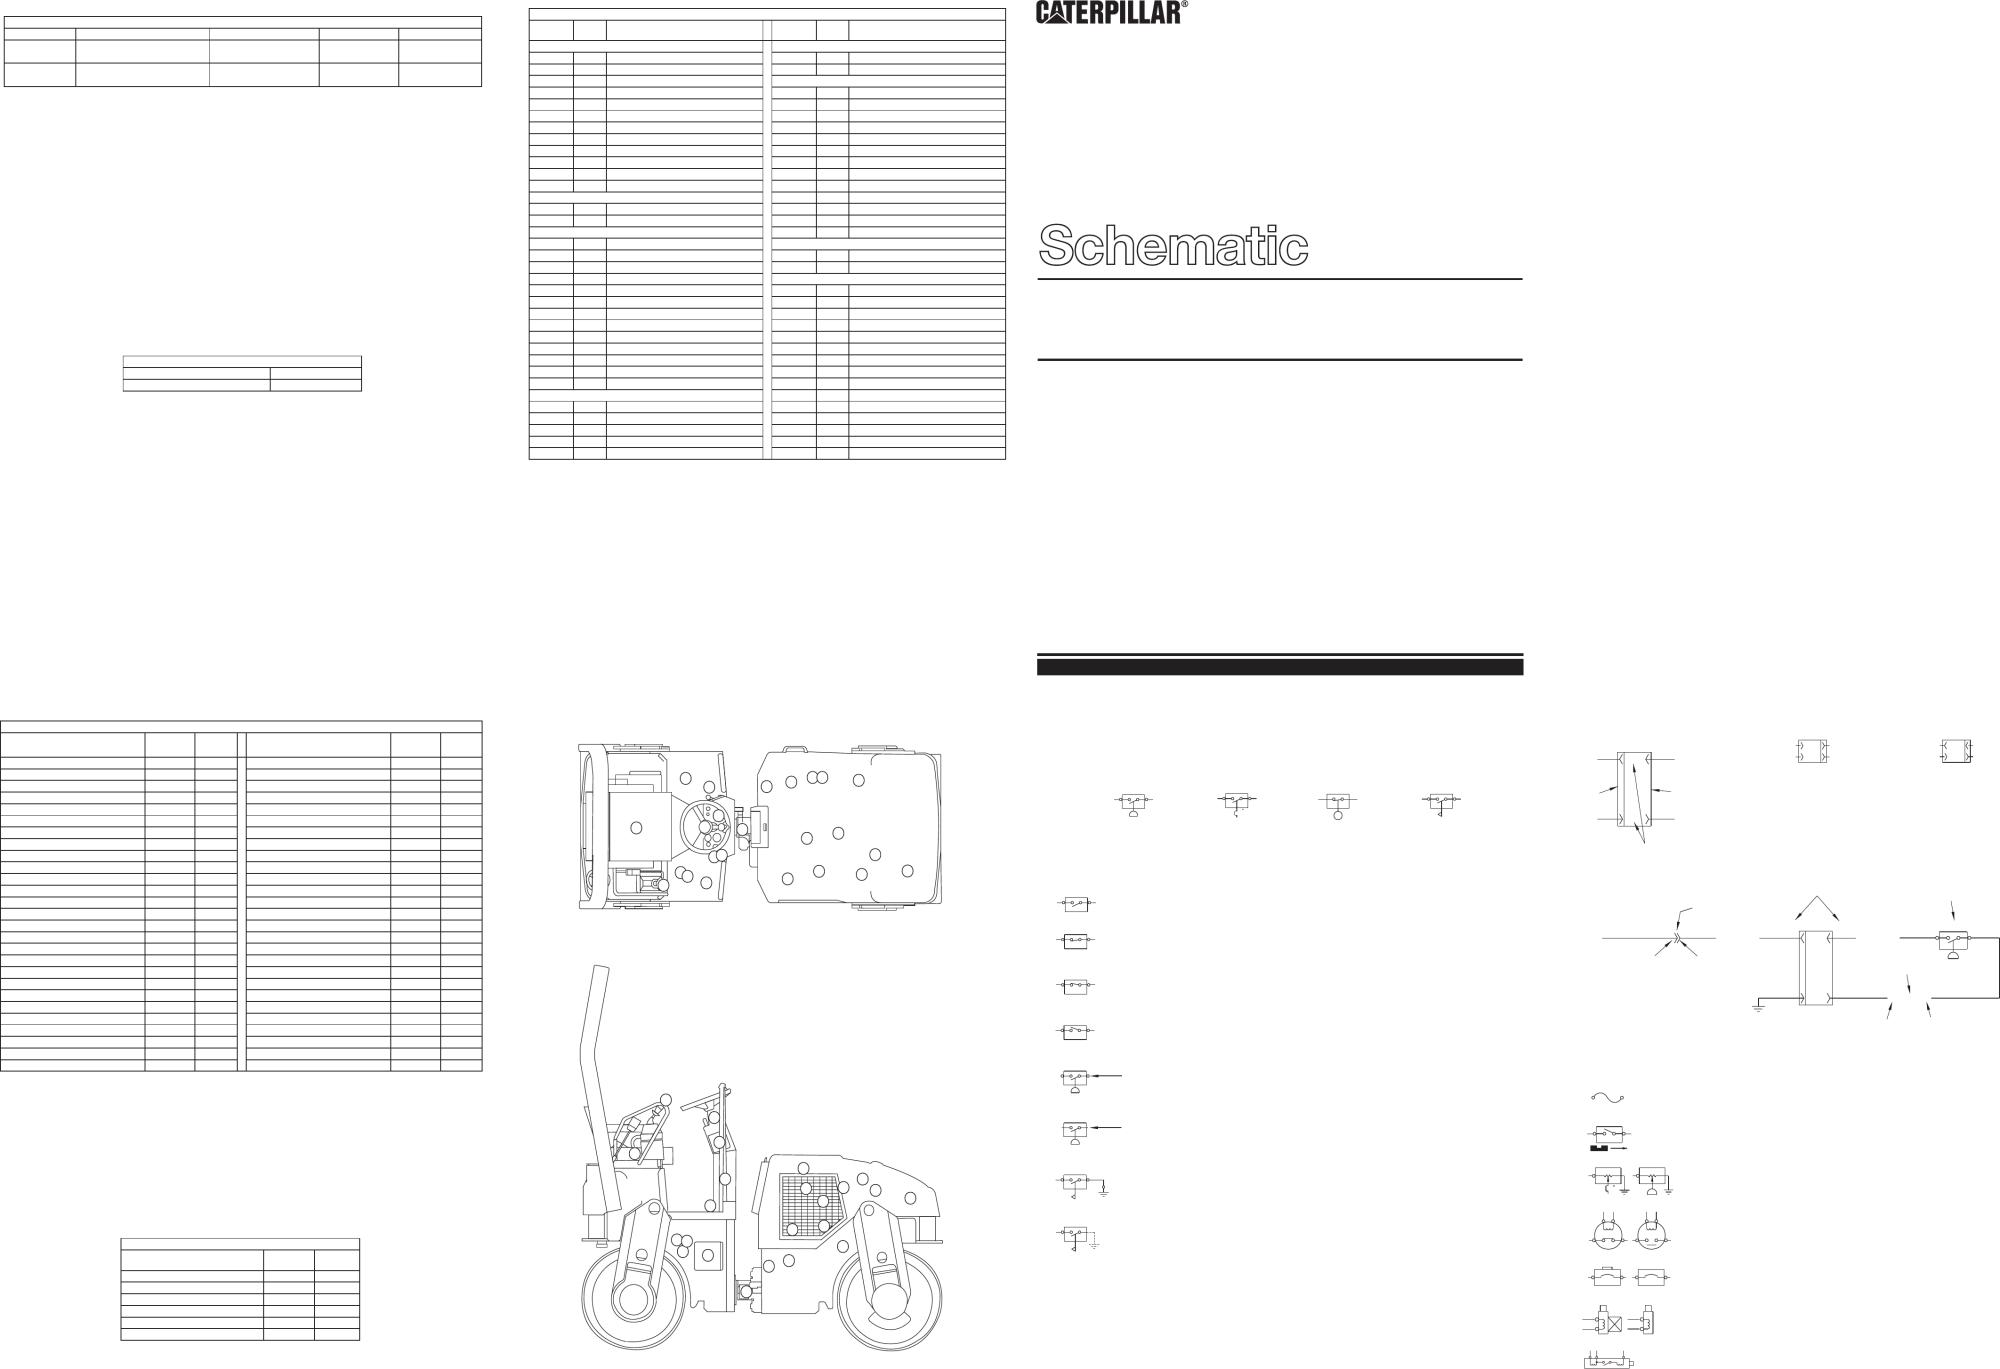 hight resolution of cb 214d cb 224d cb 225d vibratory compactors electrical schematic 2000 caterpillar